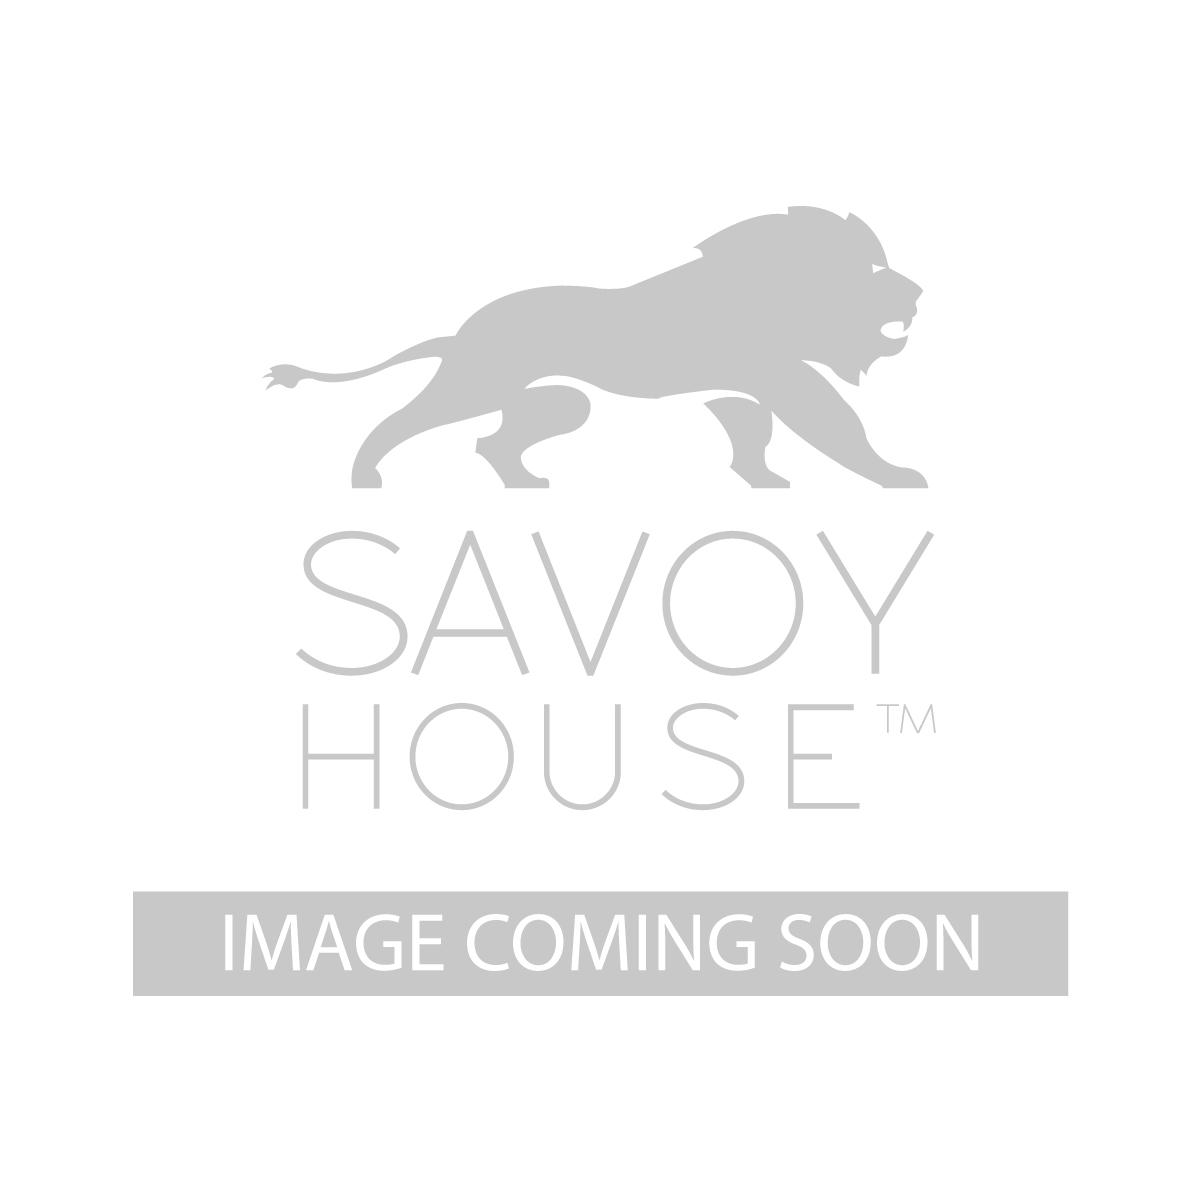 8-1080-4-SN Fontaine 4 Light Bath Bar by Savoy House